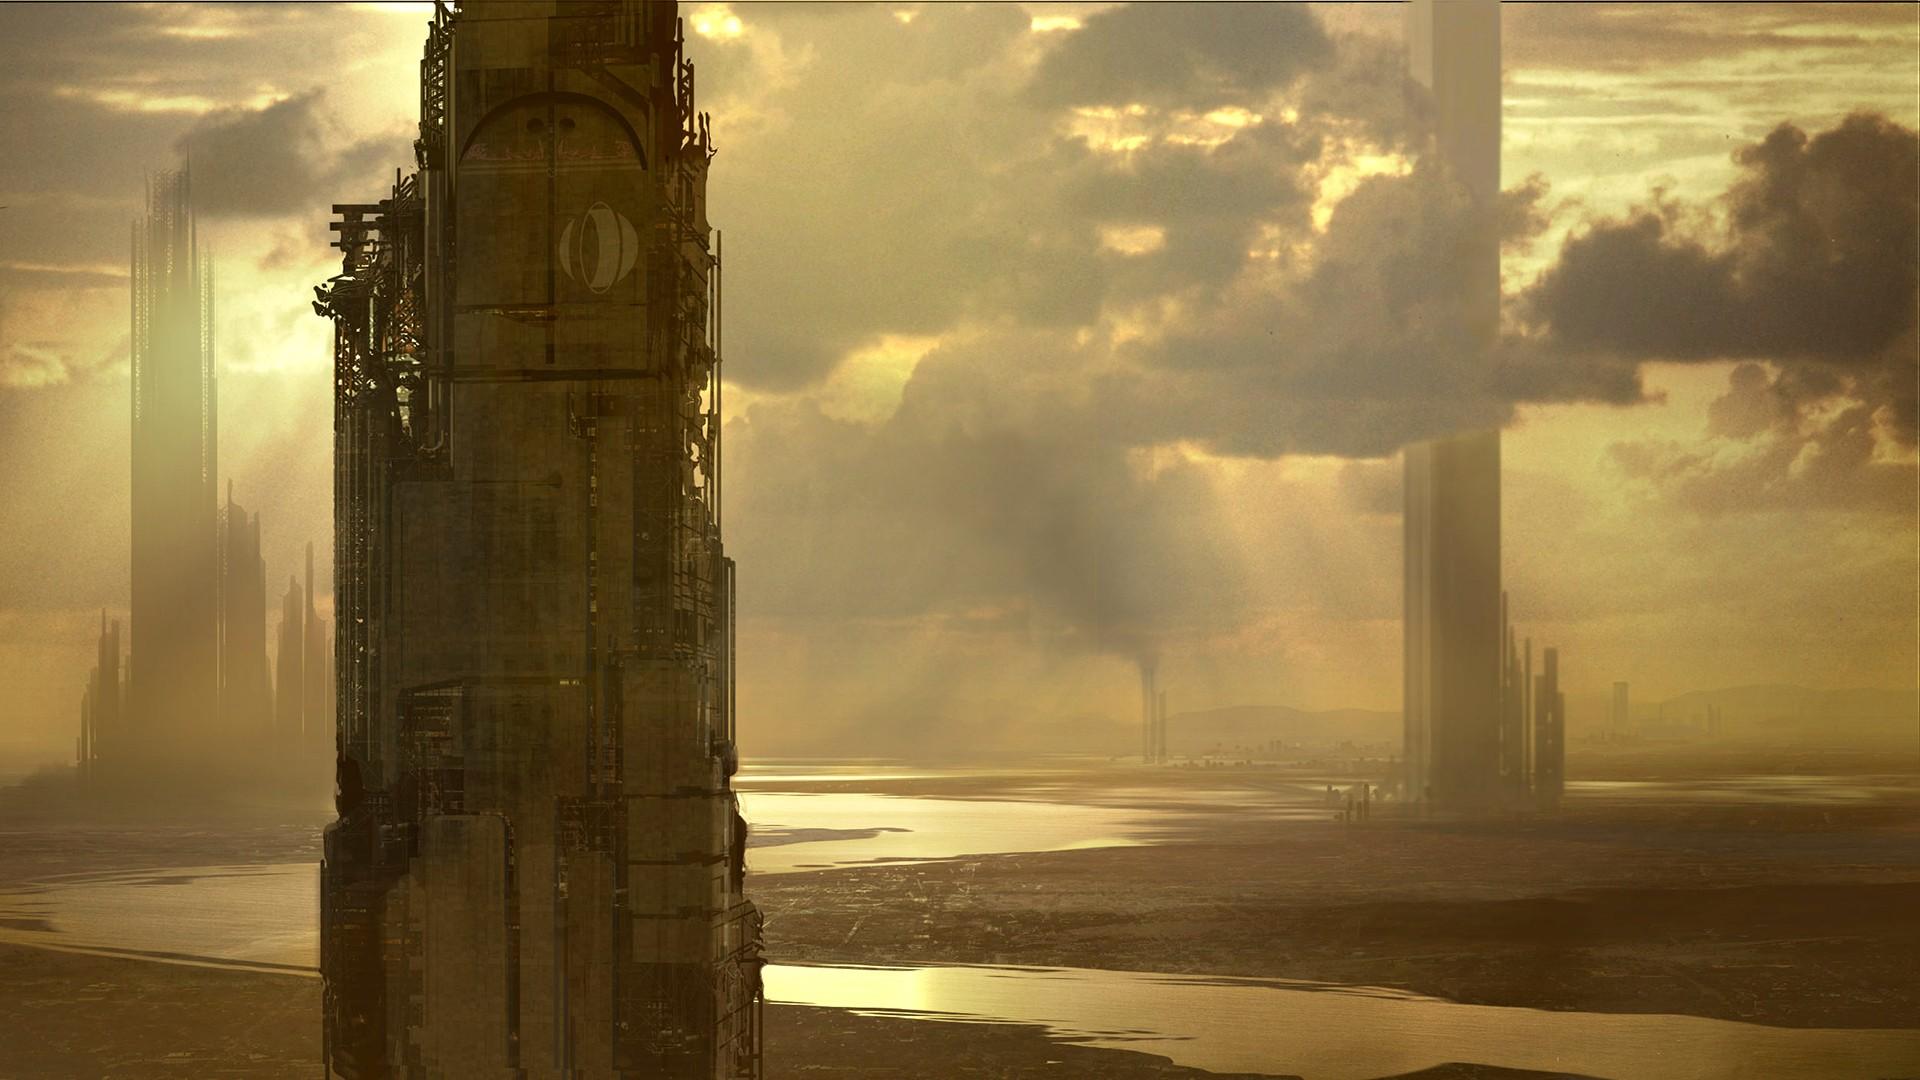 General 1920x1080 cyberpunk futuristic science fiction sky